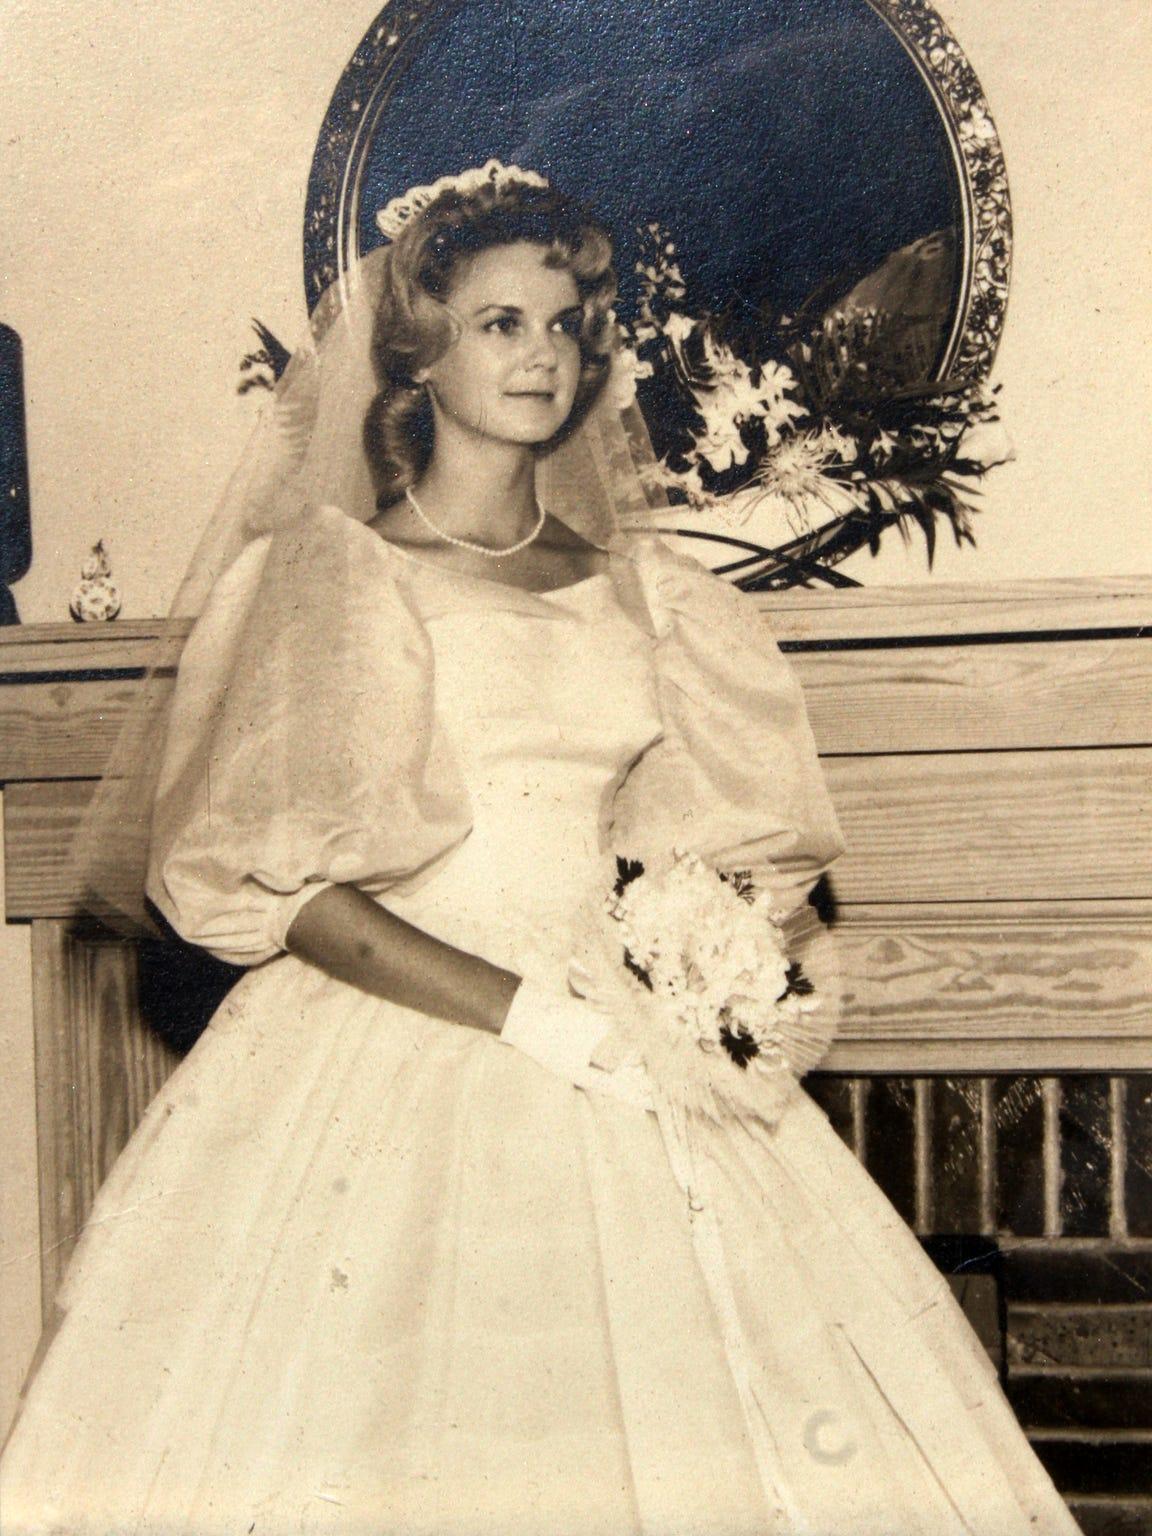 Photograph of Mary Elizabeth Horton Vail, taken on